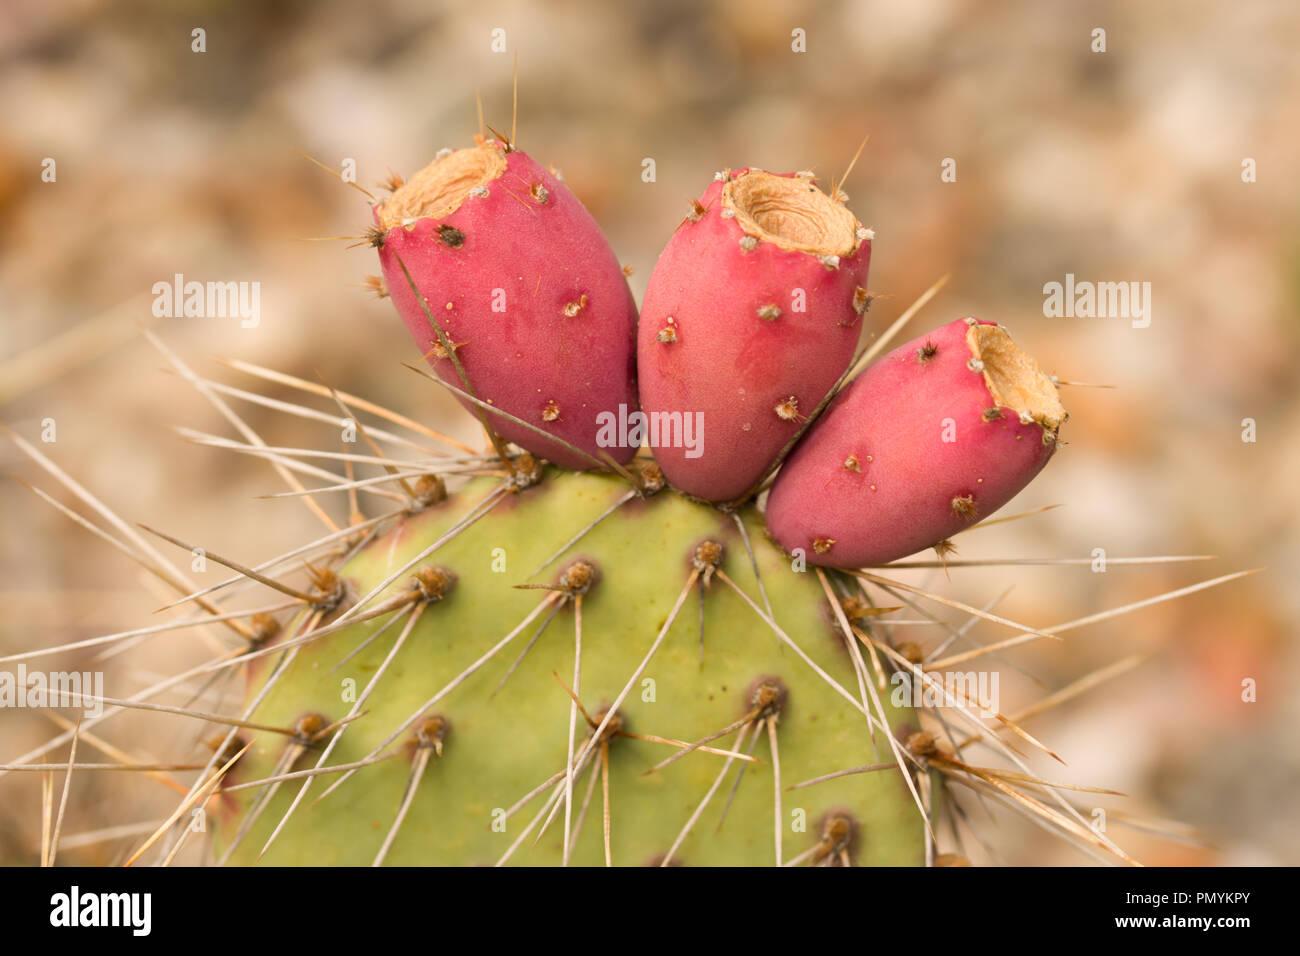 Close Up On The Fruits Of Opuntia Polyacantha Var Polyacantha